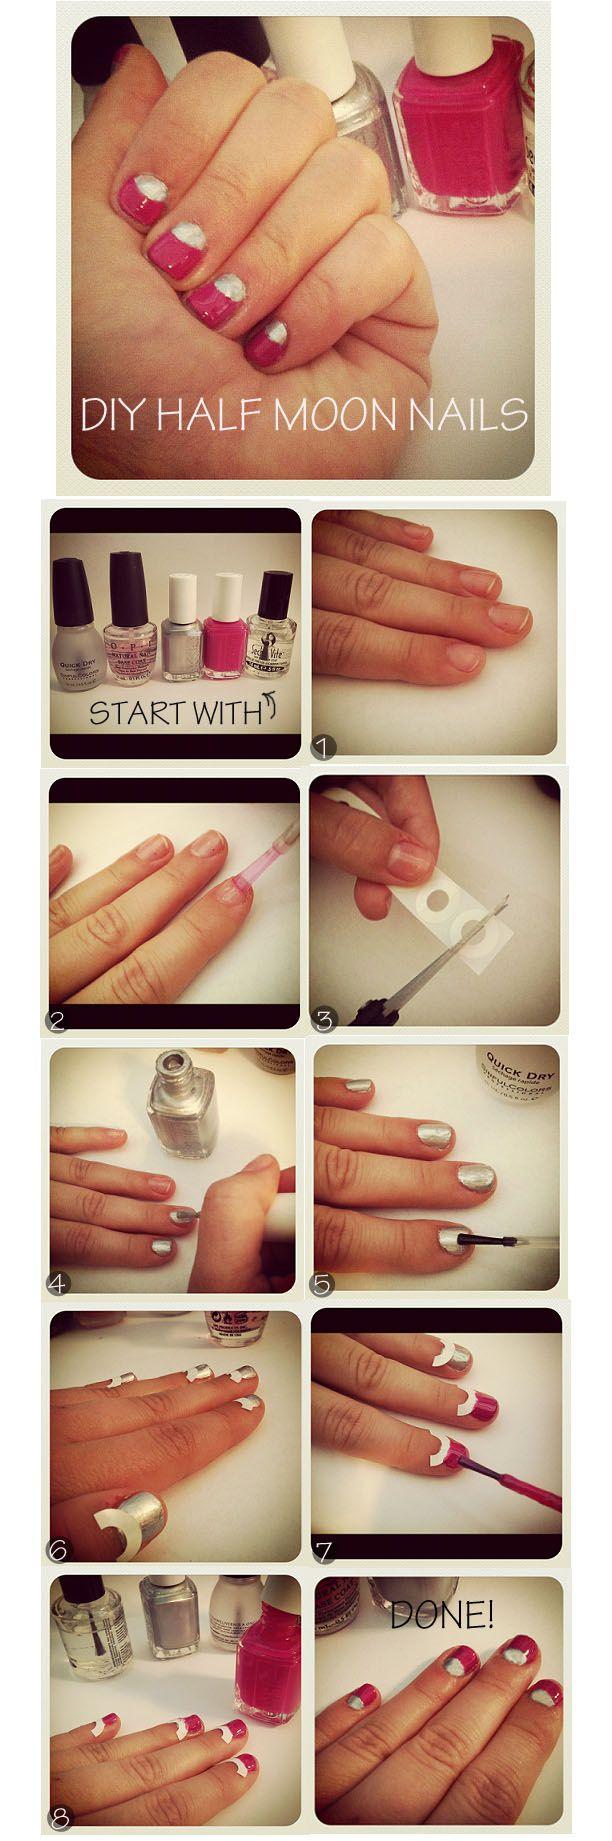 DIY Half Moon Nails